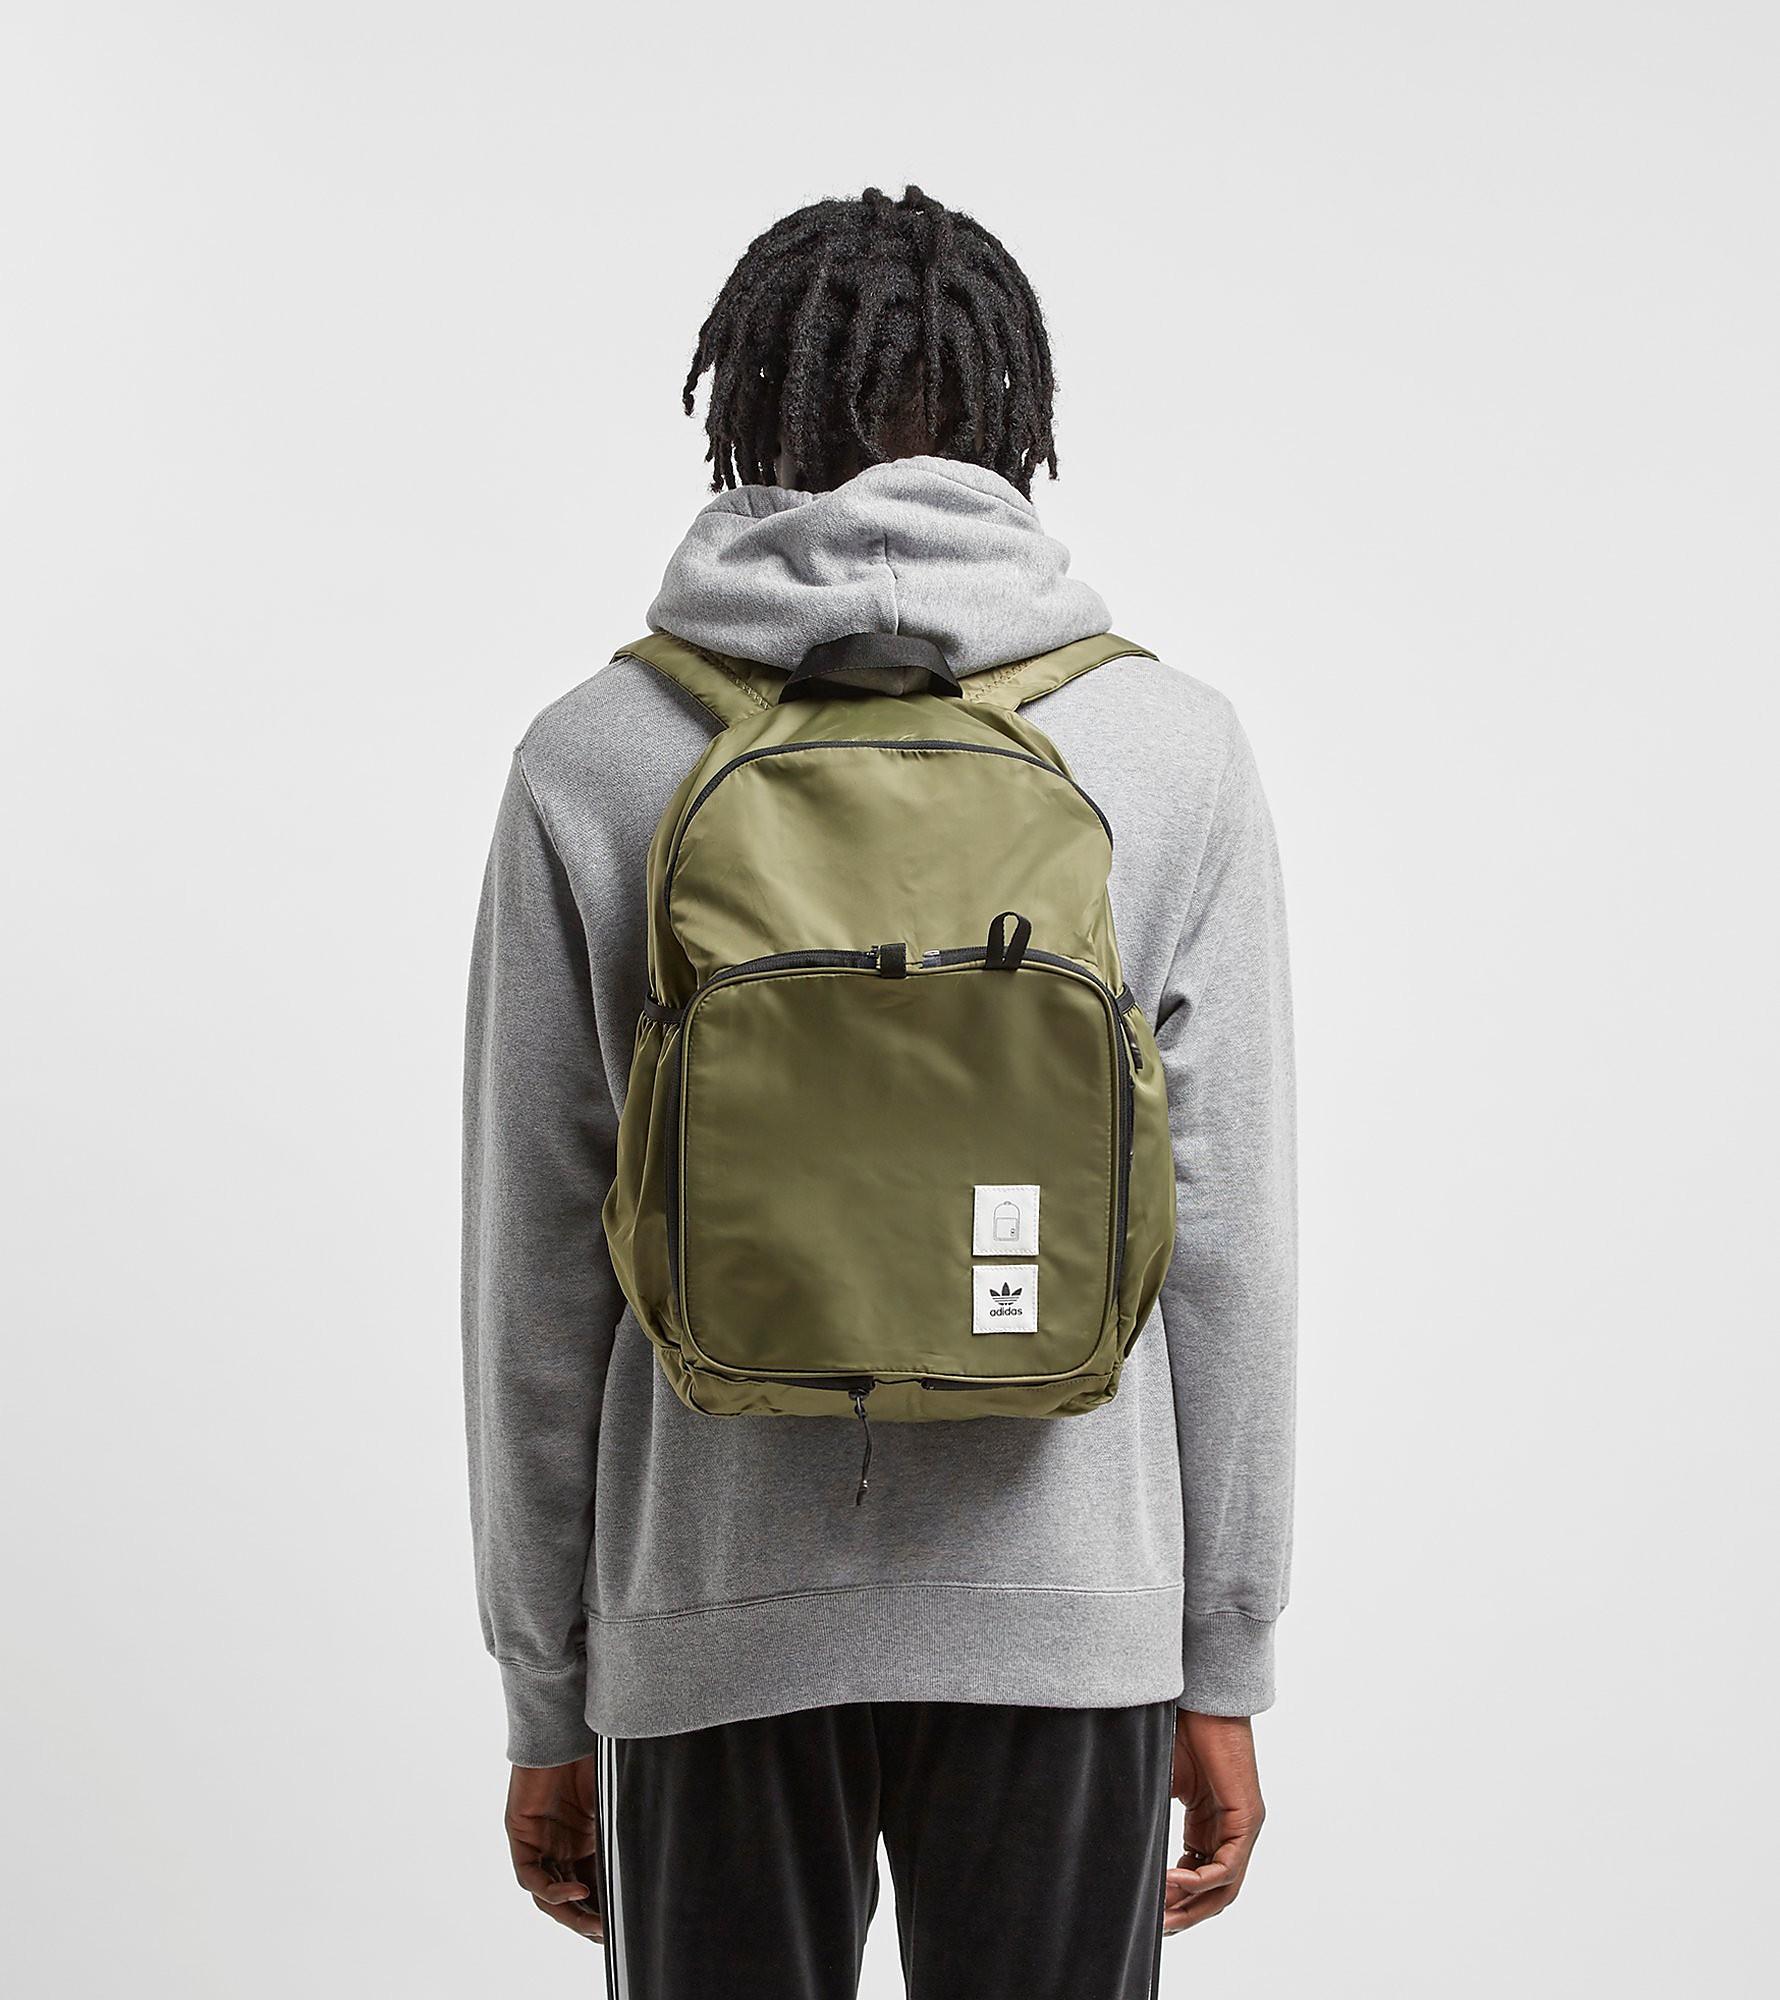 adidas Originals Packable Backpack, Groen